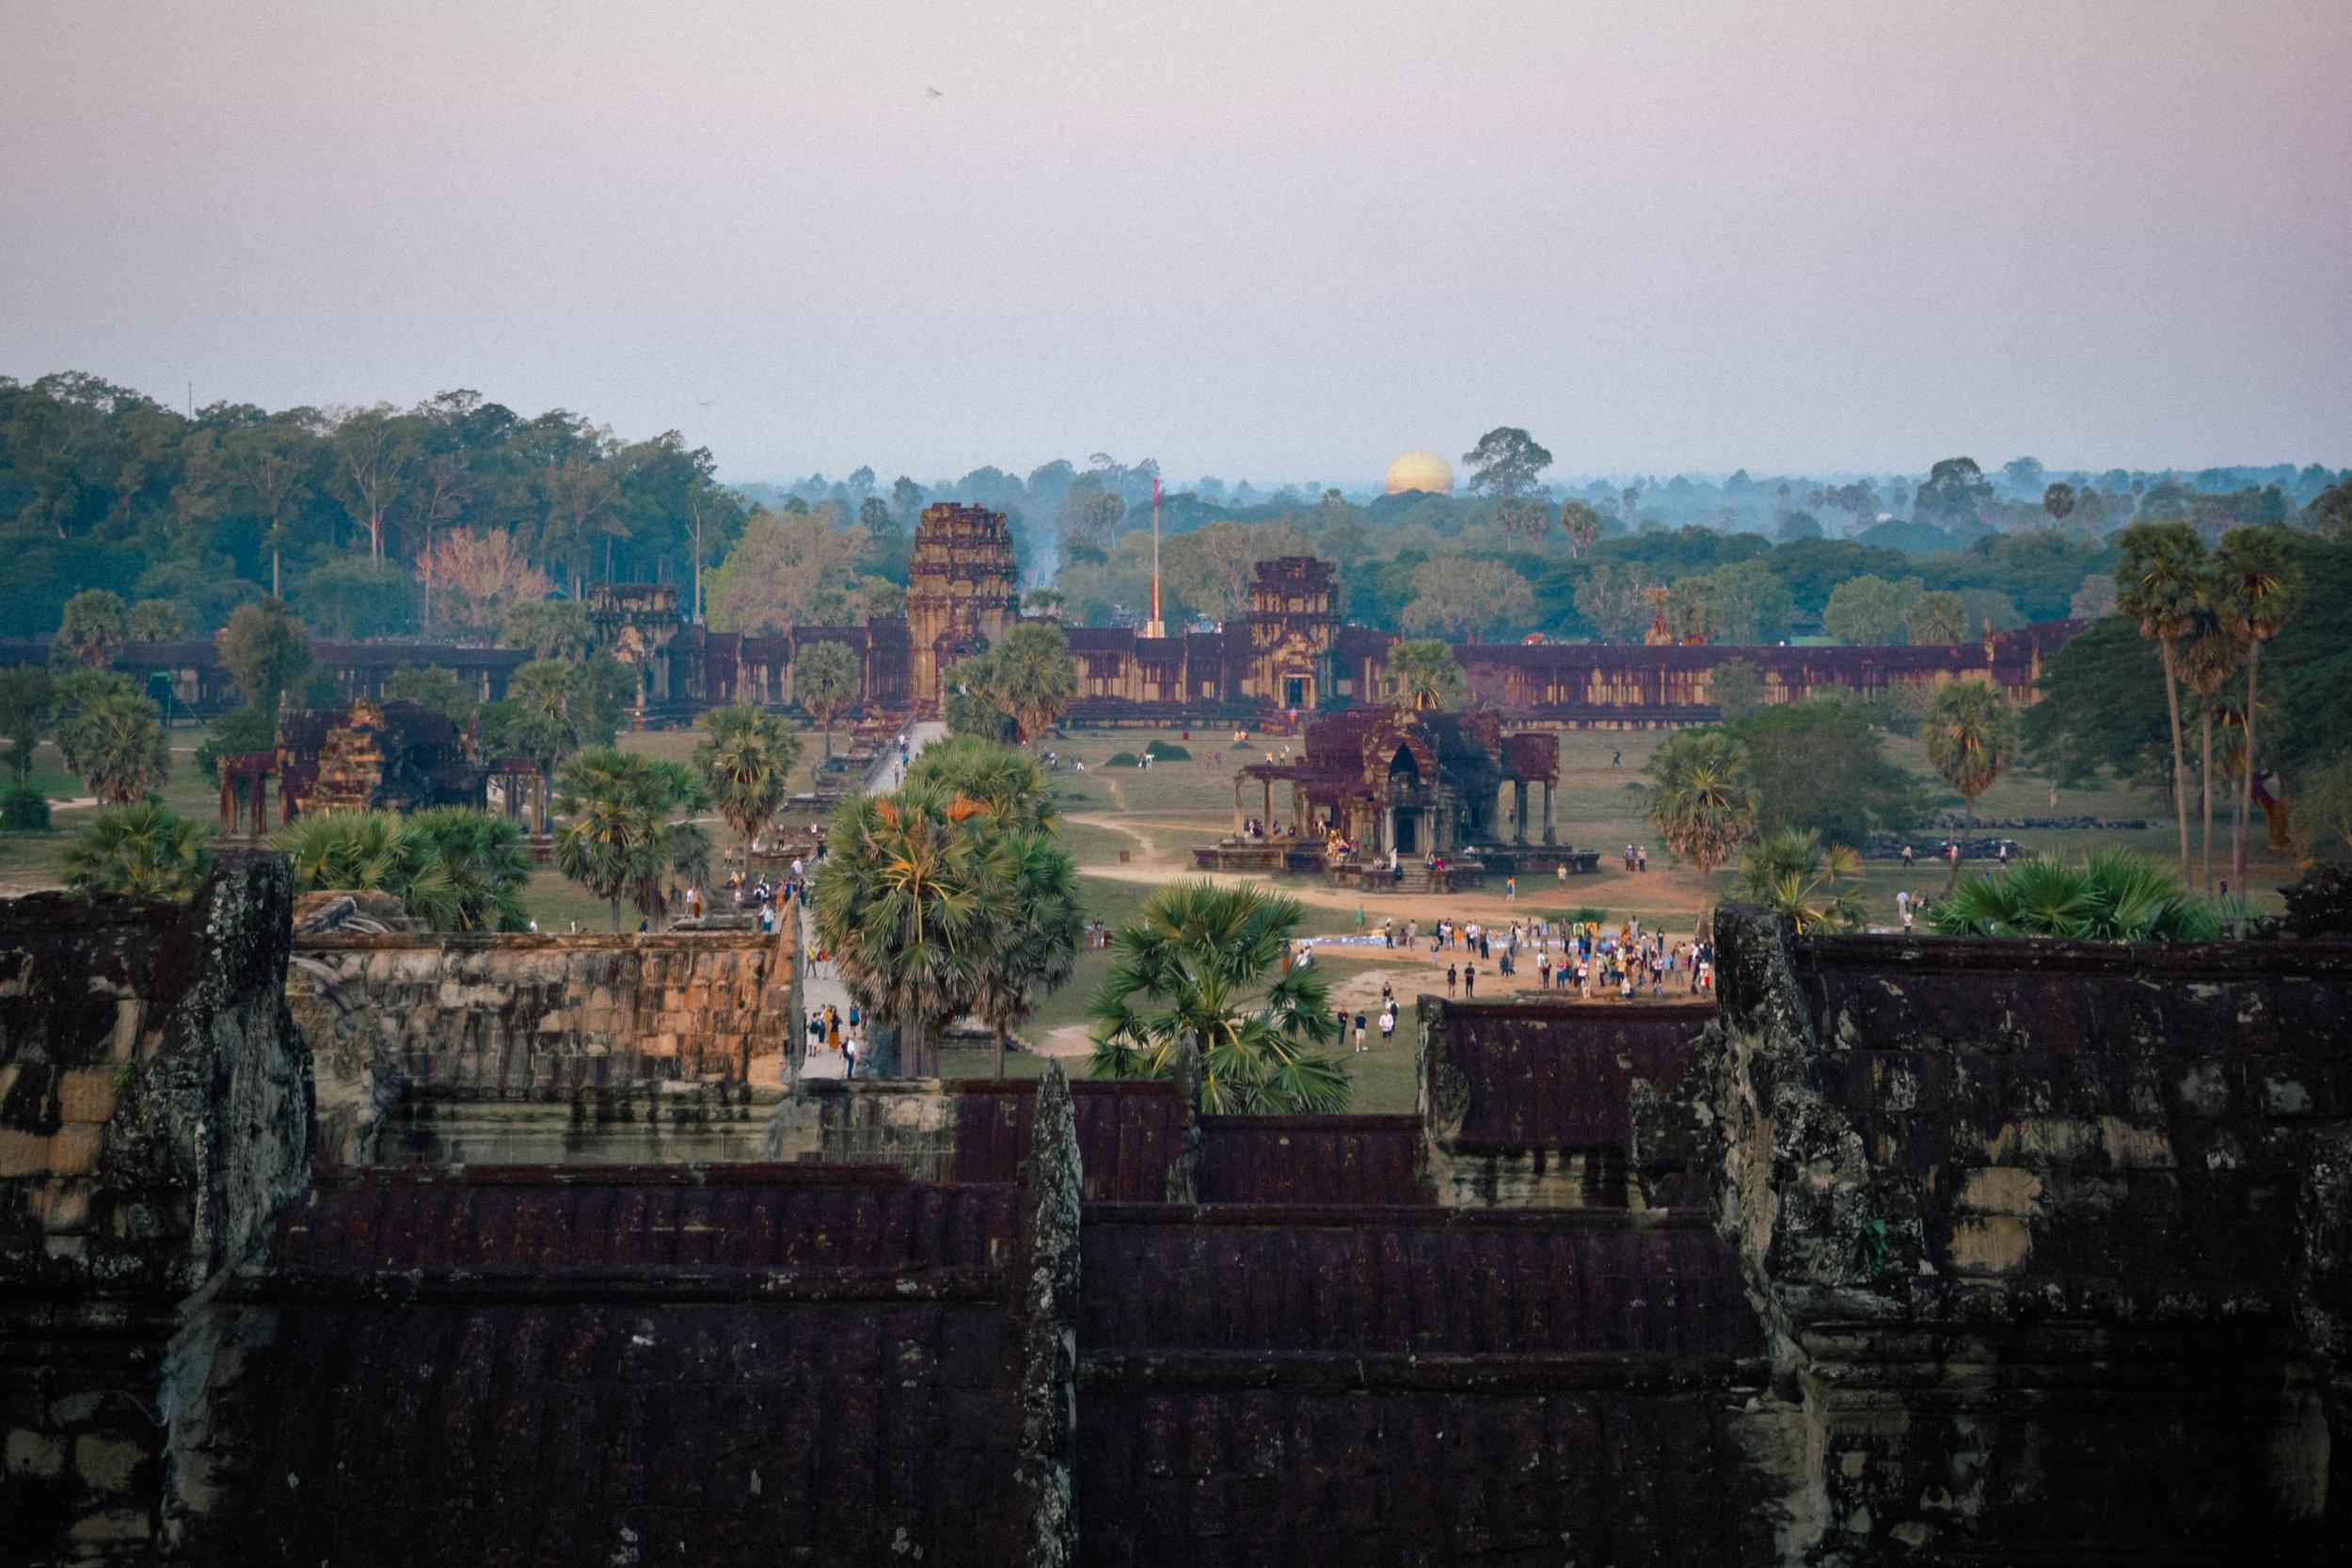 Panorama of angkor wat view